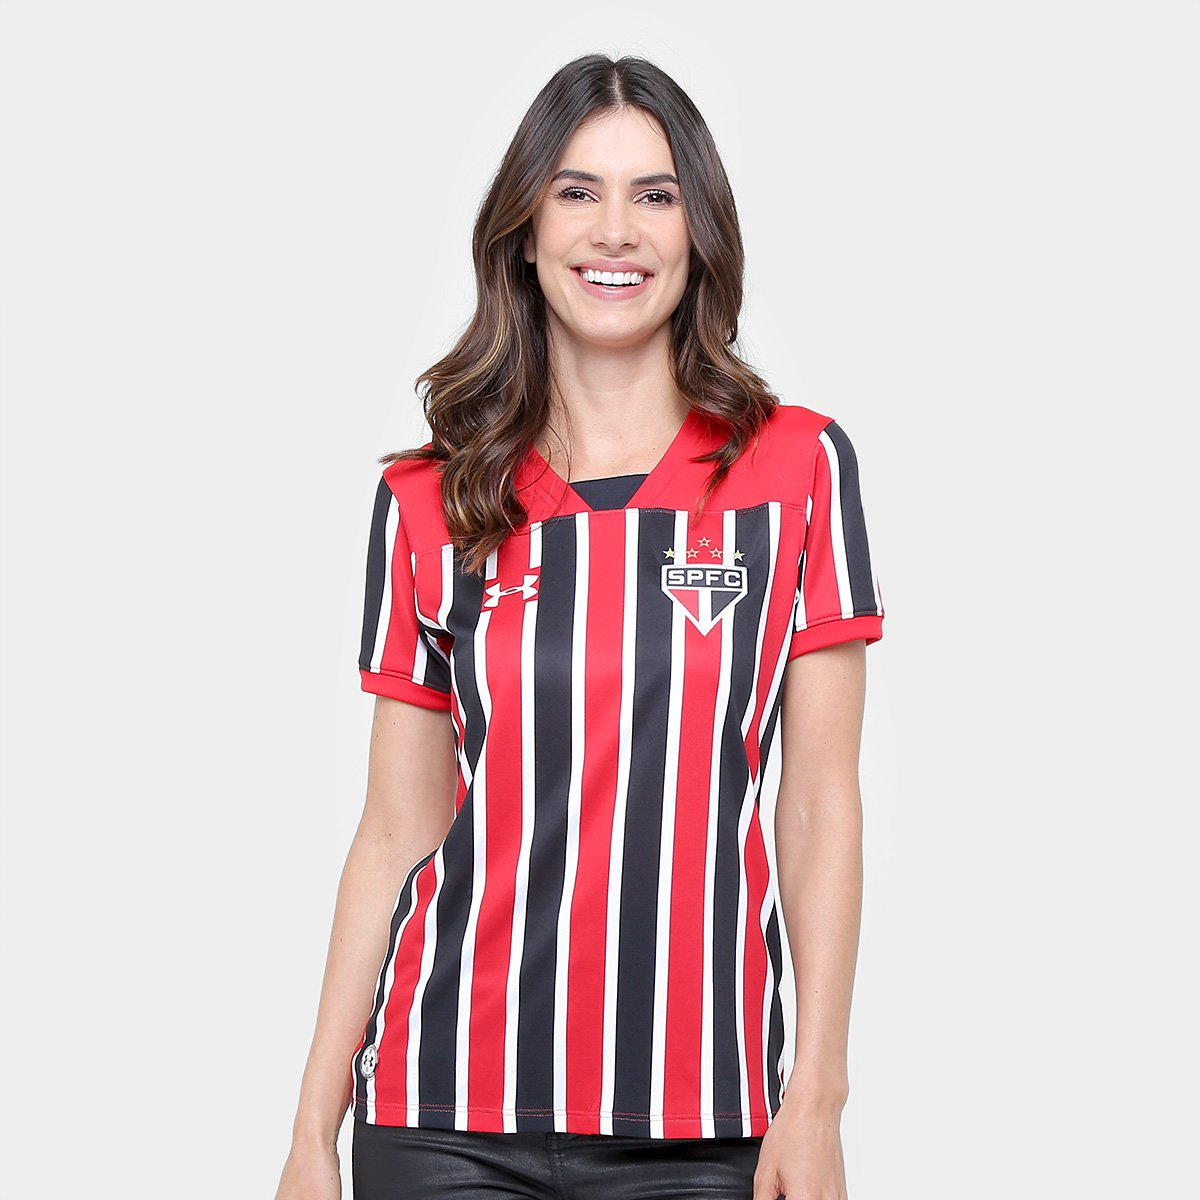 1a61d0b320 Camisa São Paulo II 17 18 s nº Torcedor Under Armour Feminina